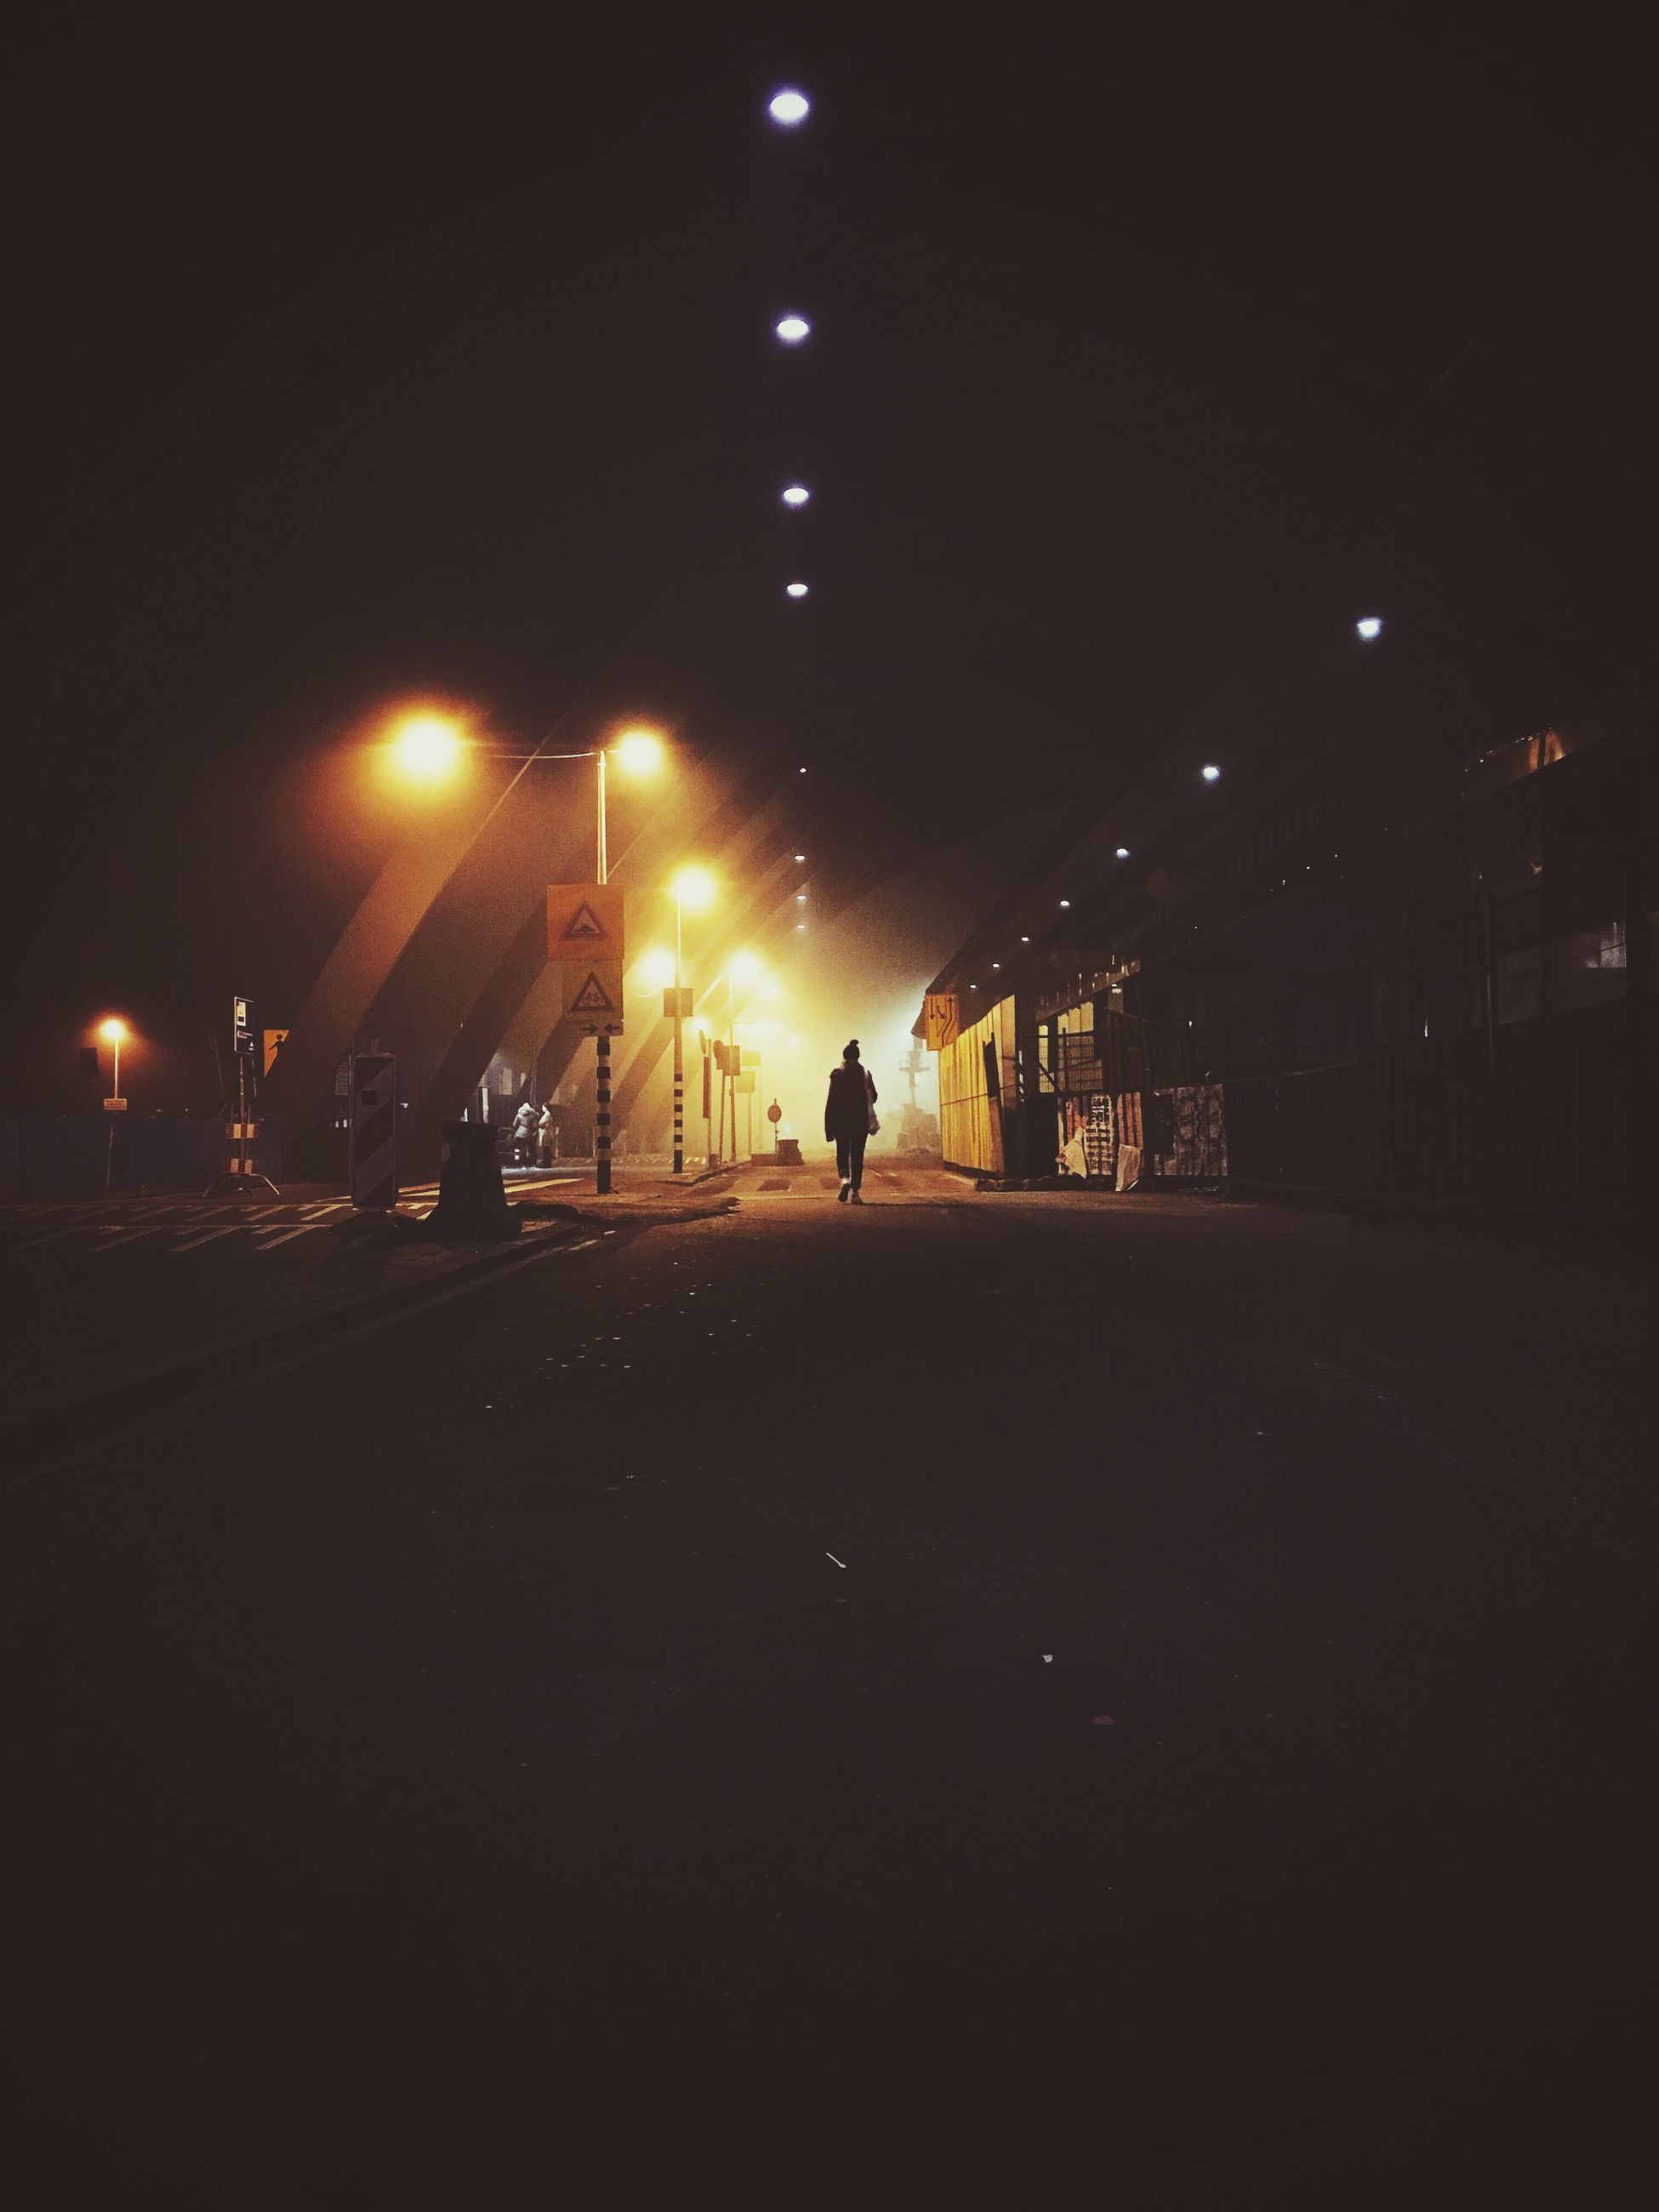 night, illuminated, street light, men, silhouette, street, walking, lifestyles, city, building exterior, the way forward, architecture, built structure, dark, lighting equipment, road, transportation, unrecognizable person, full length